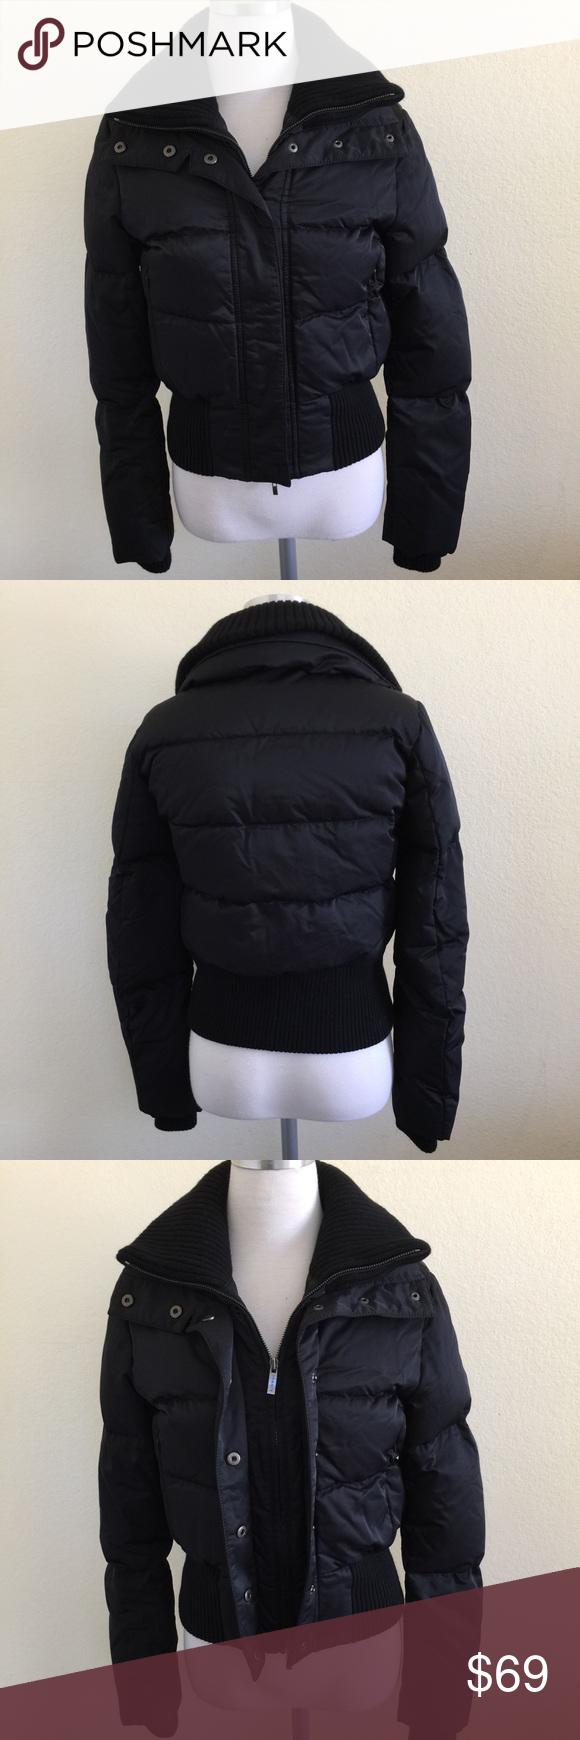 Theory Black Down Puffer Bomber Jacket Xs P Tp Fashion Clothes Design Fashion Design [ 1740 x 580 Pixel ]